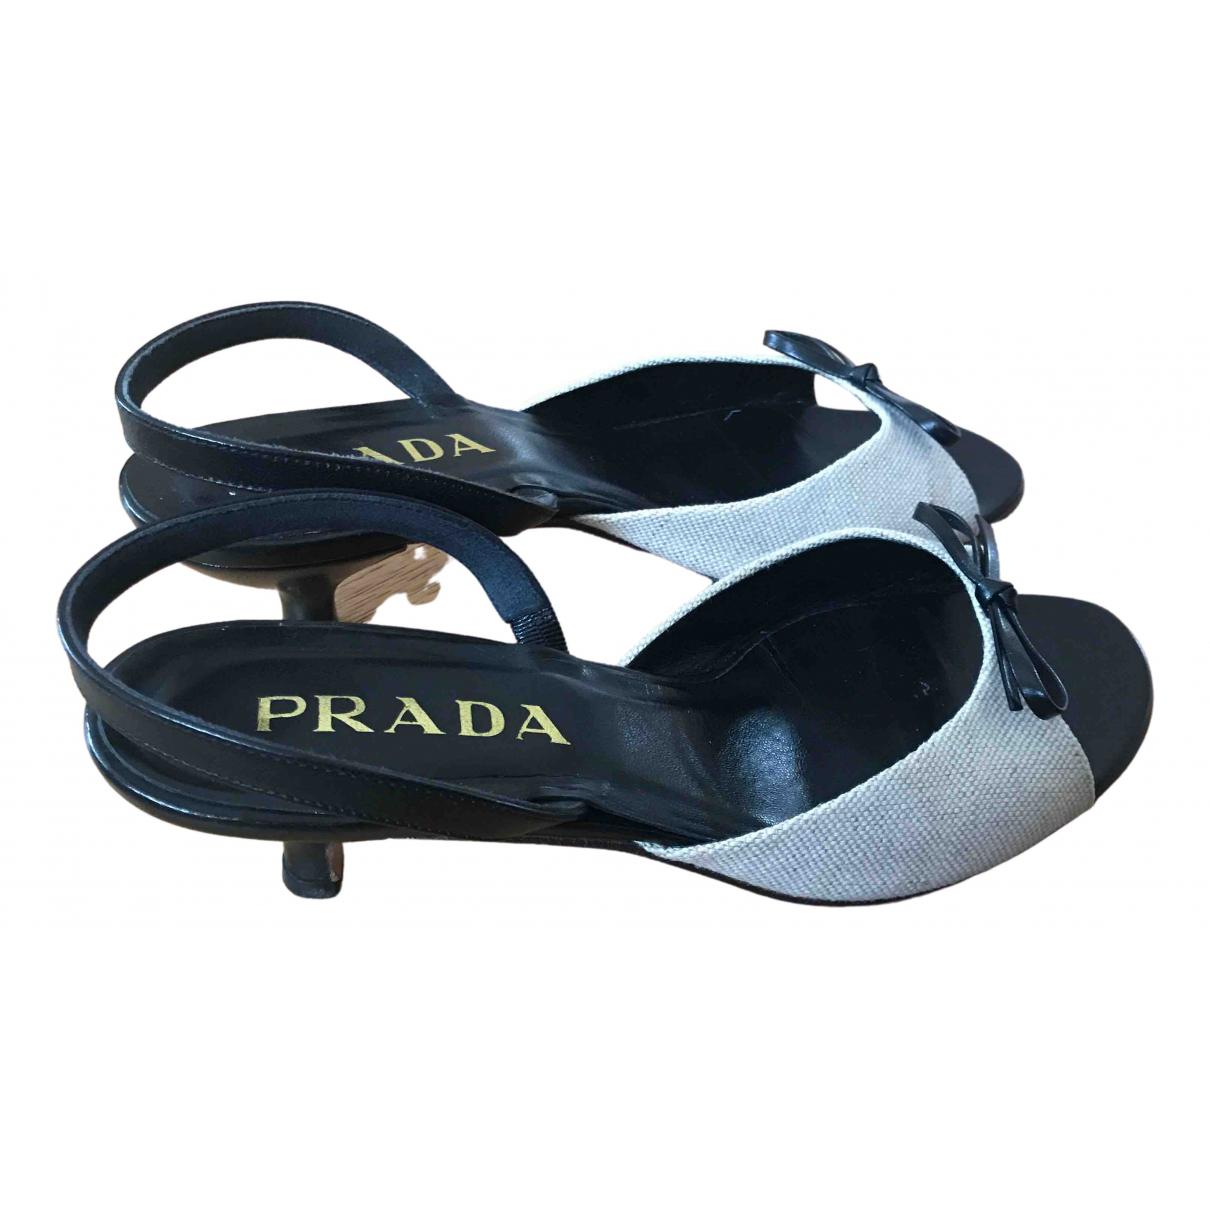 Prada - Sandales   pour femme en toile - ecru